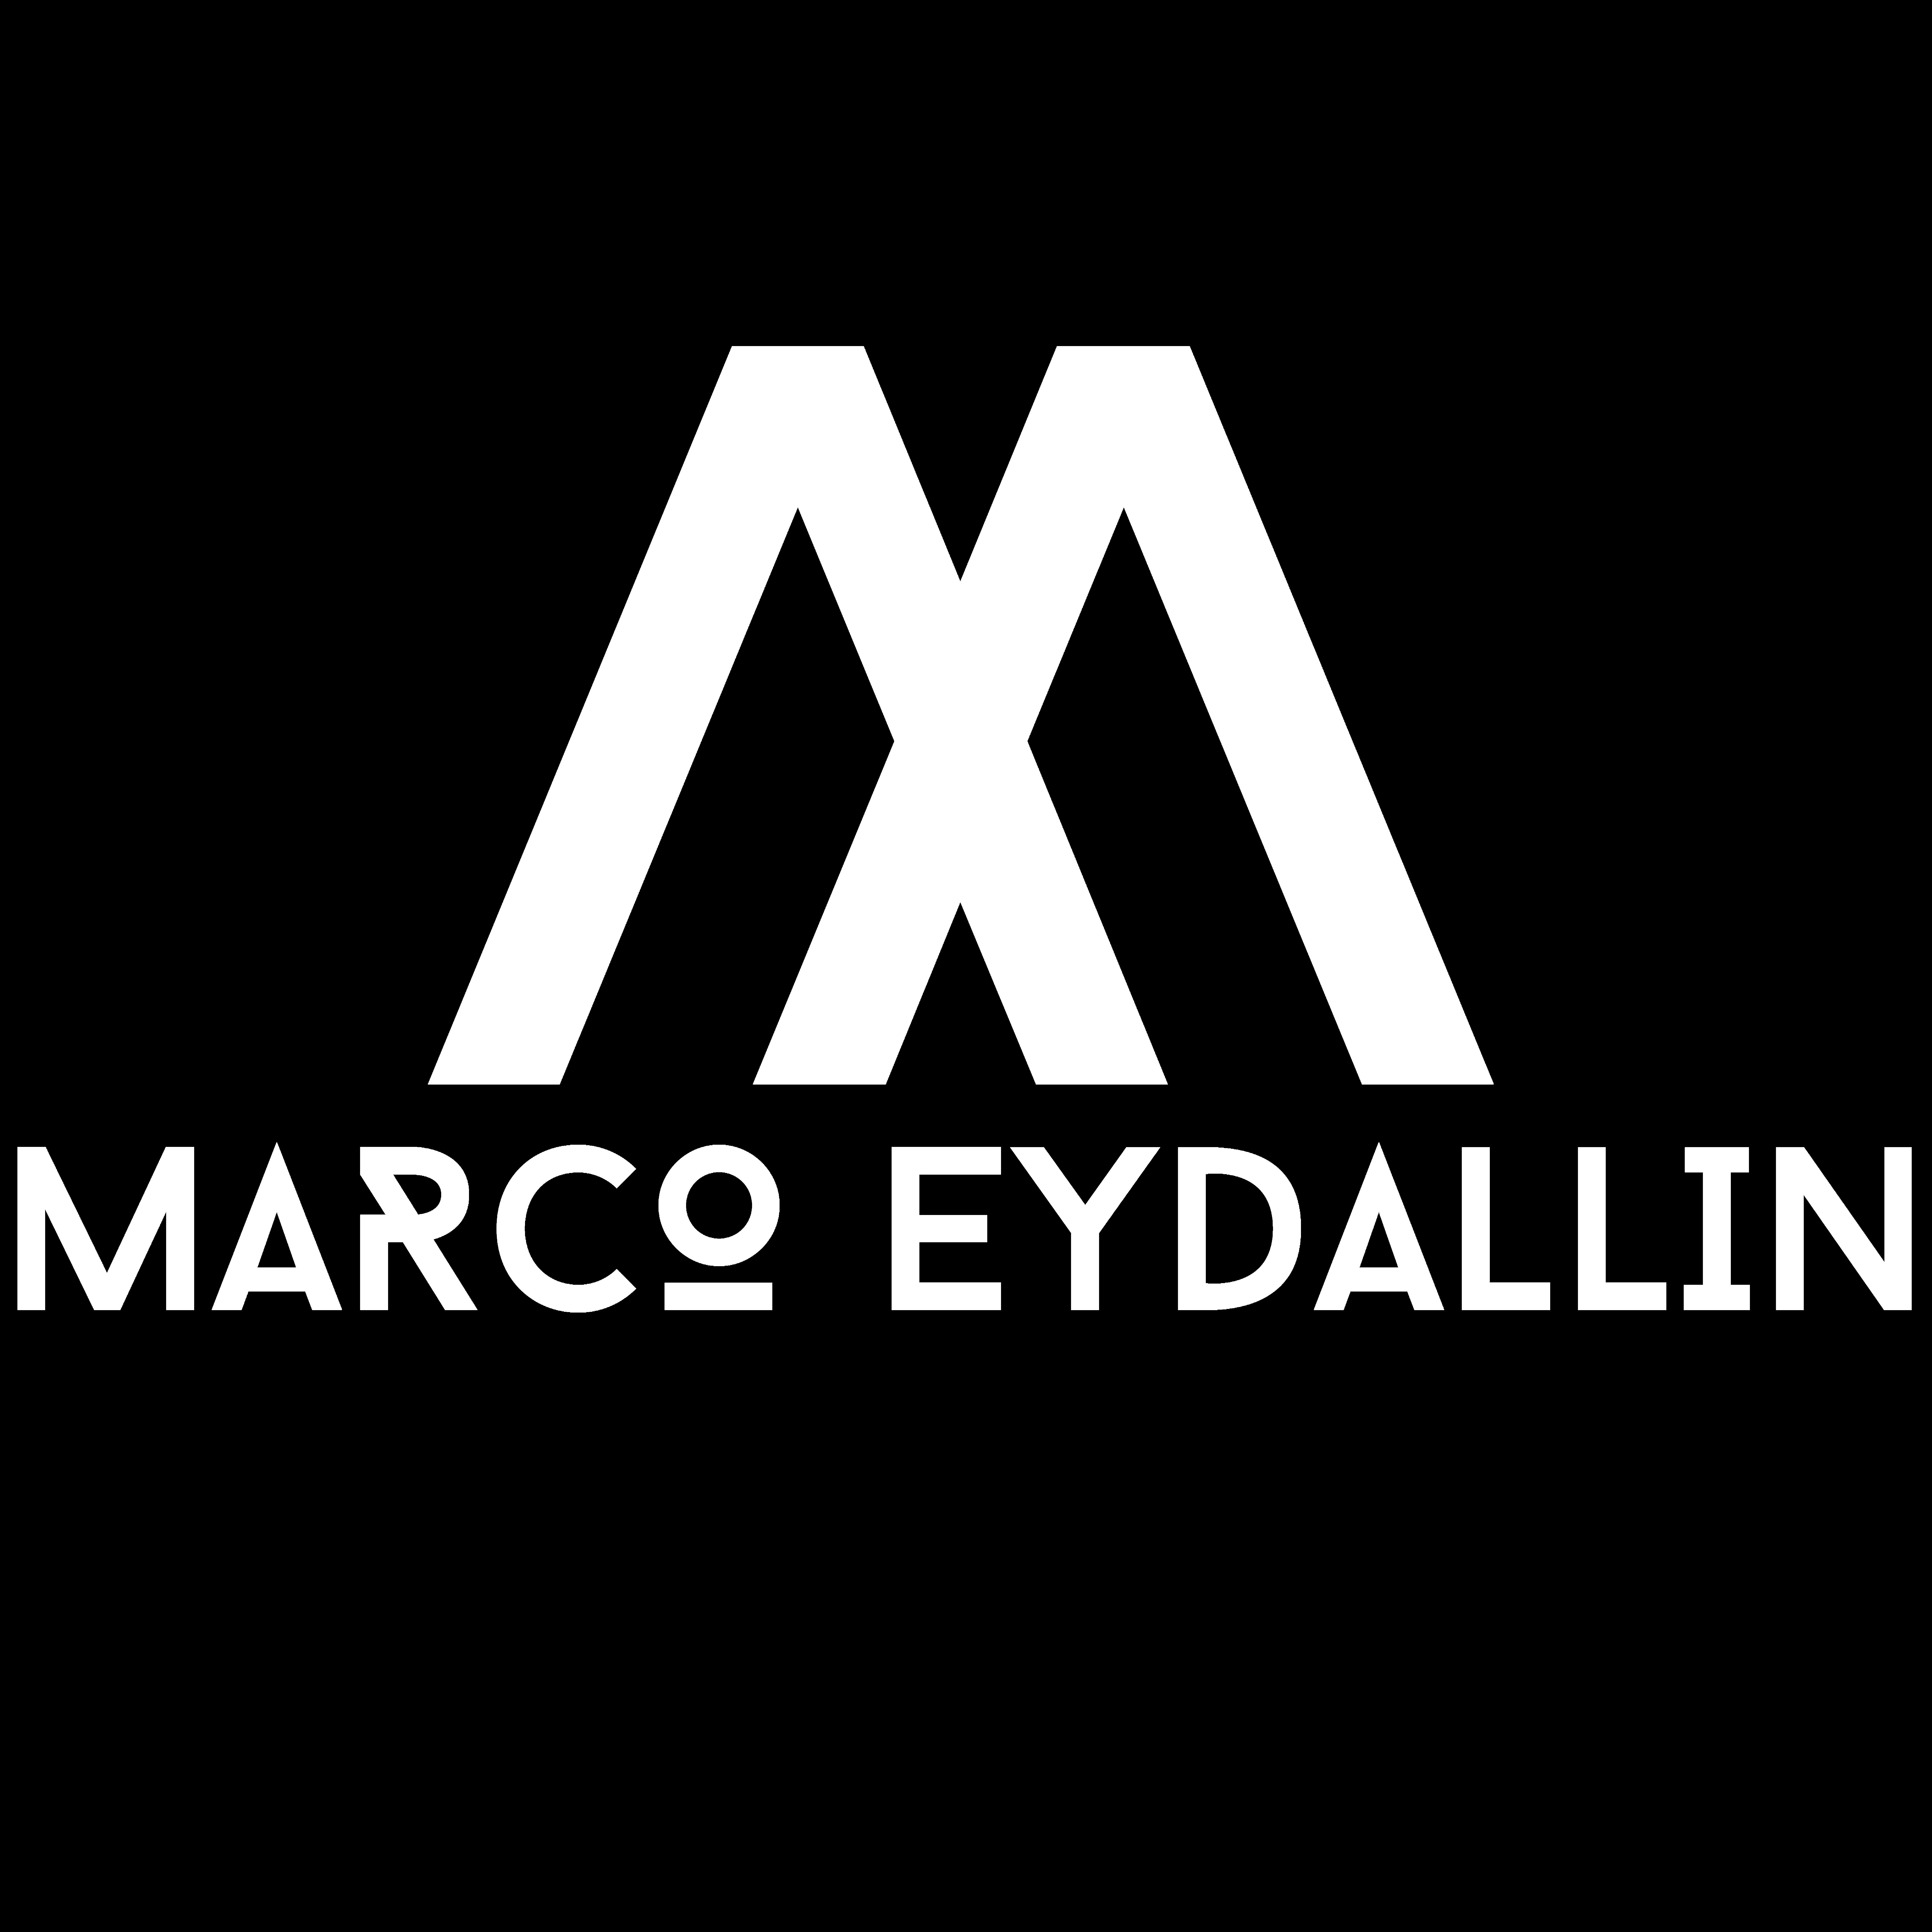 Marco Eydallin